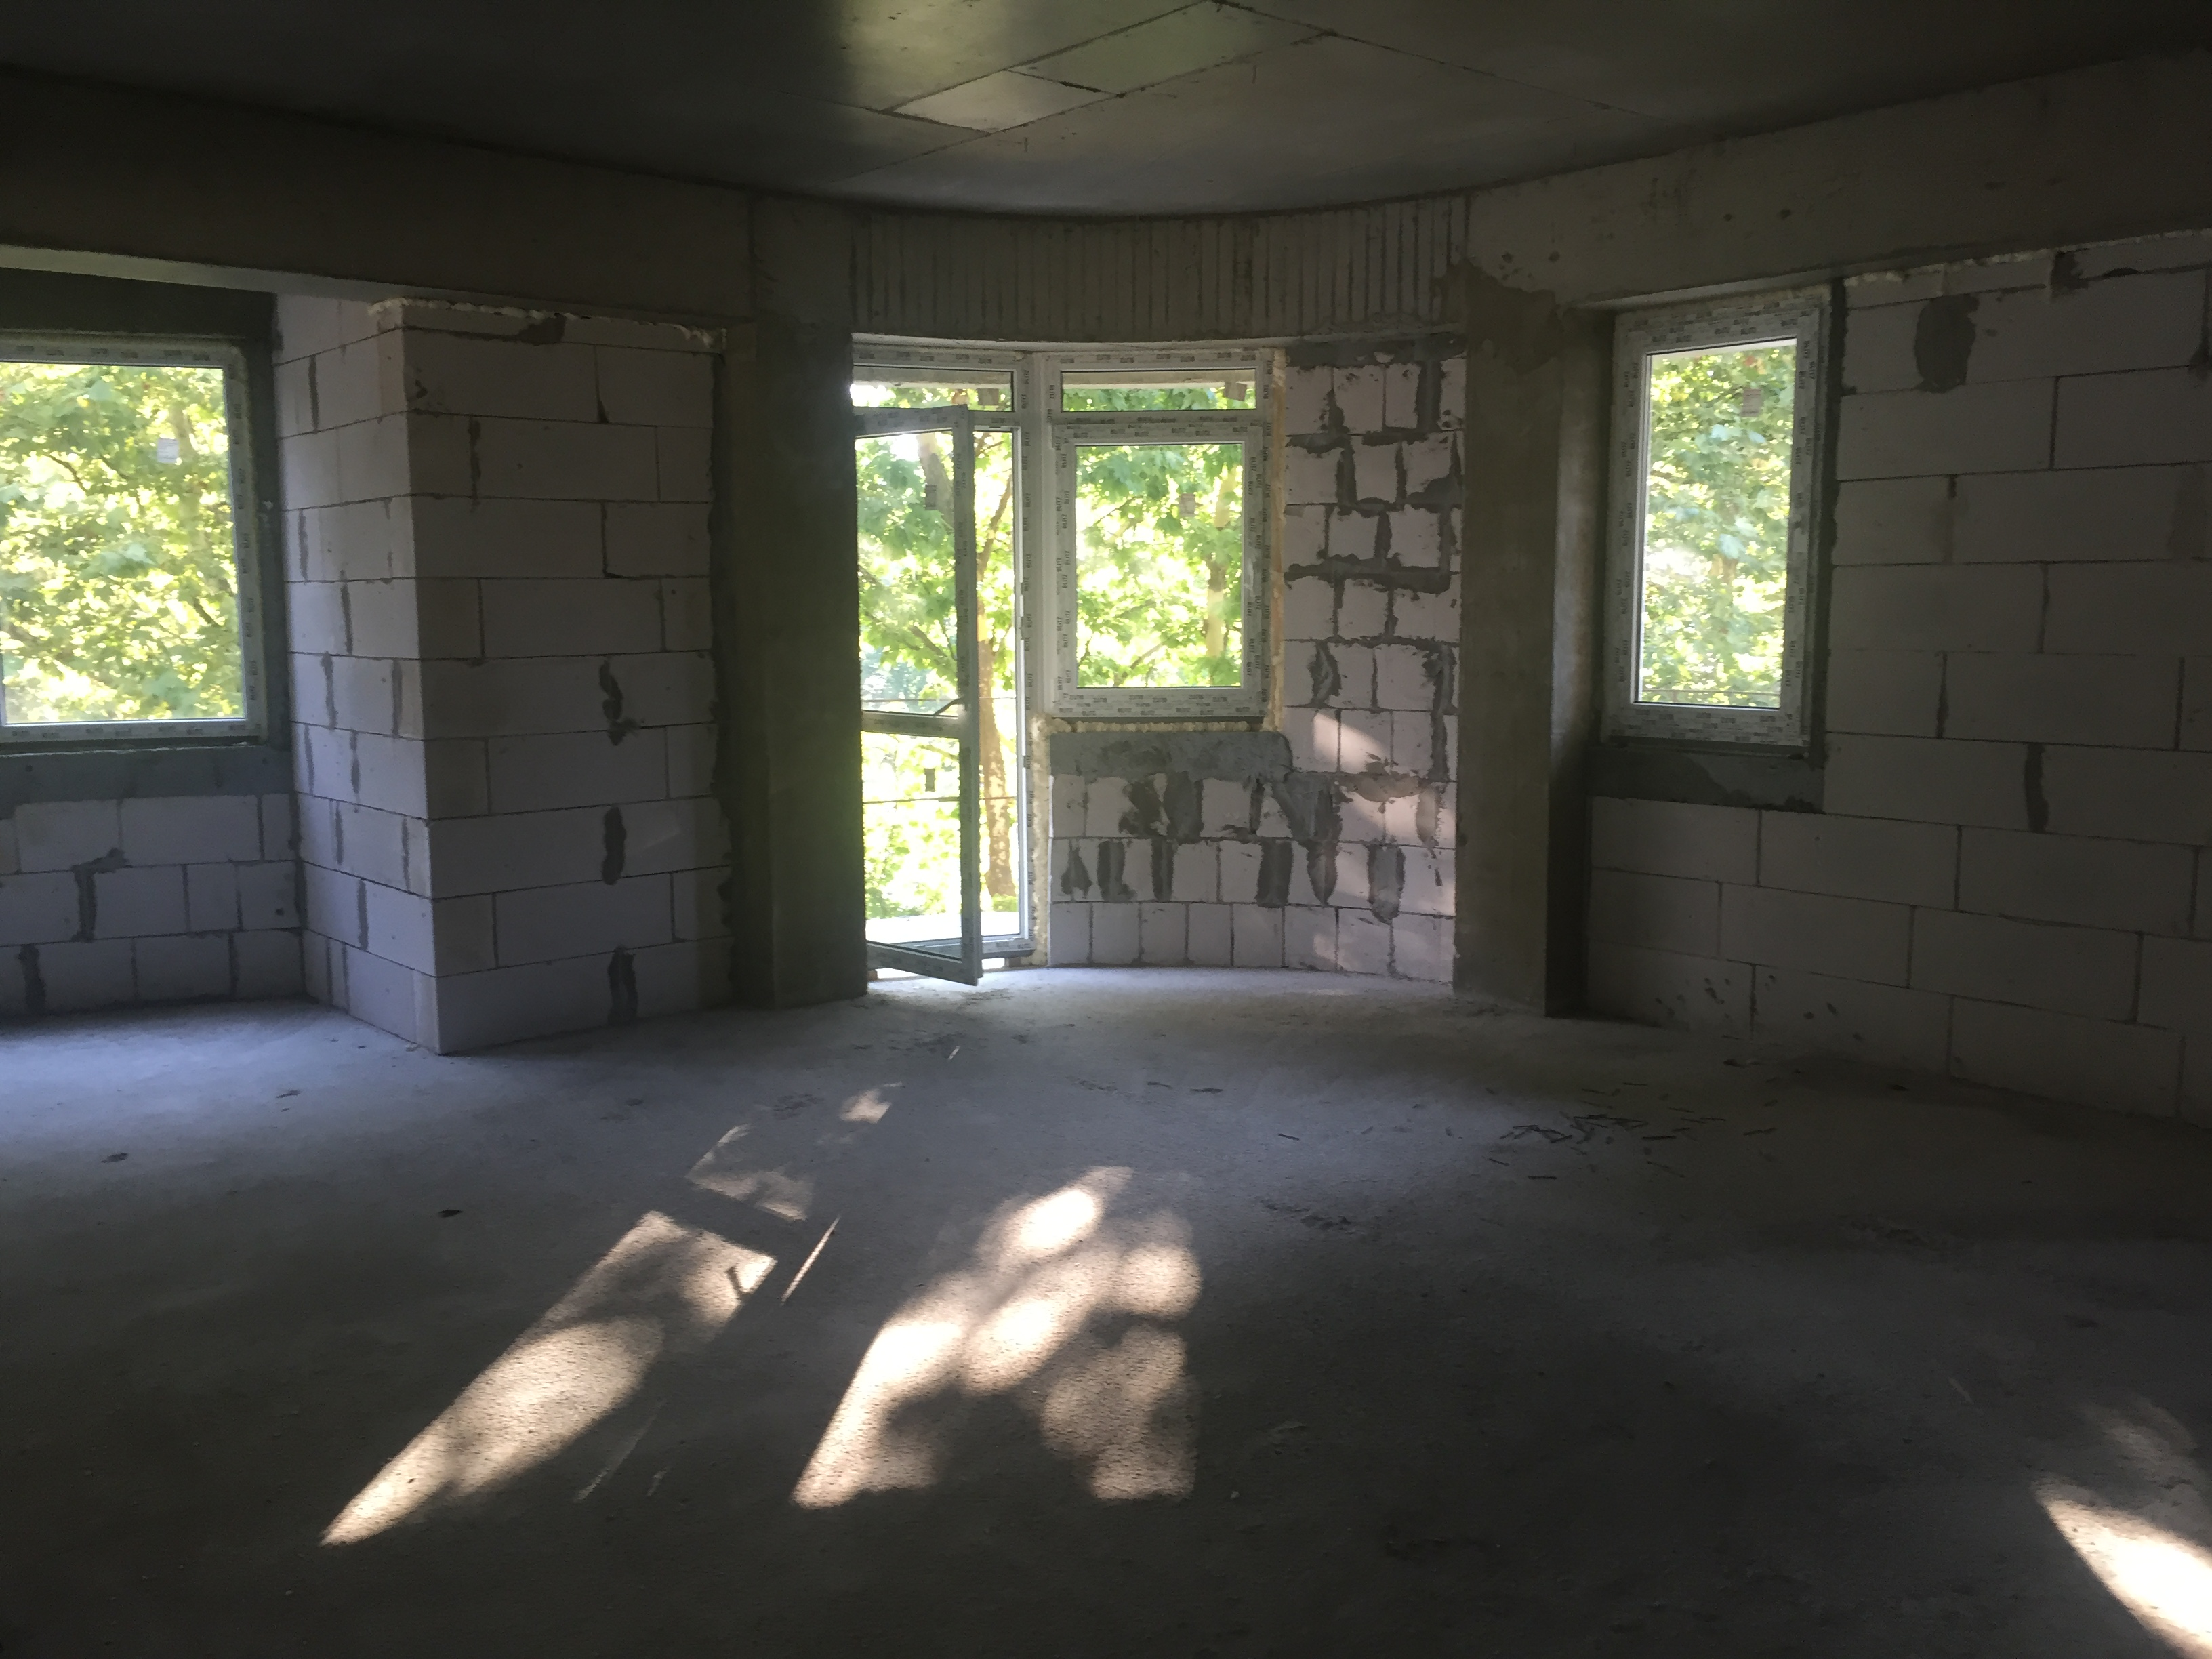 Продам - Квартира в новом доме -Вишневая  - цена: 3565000